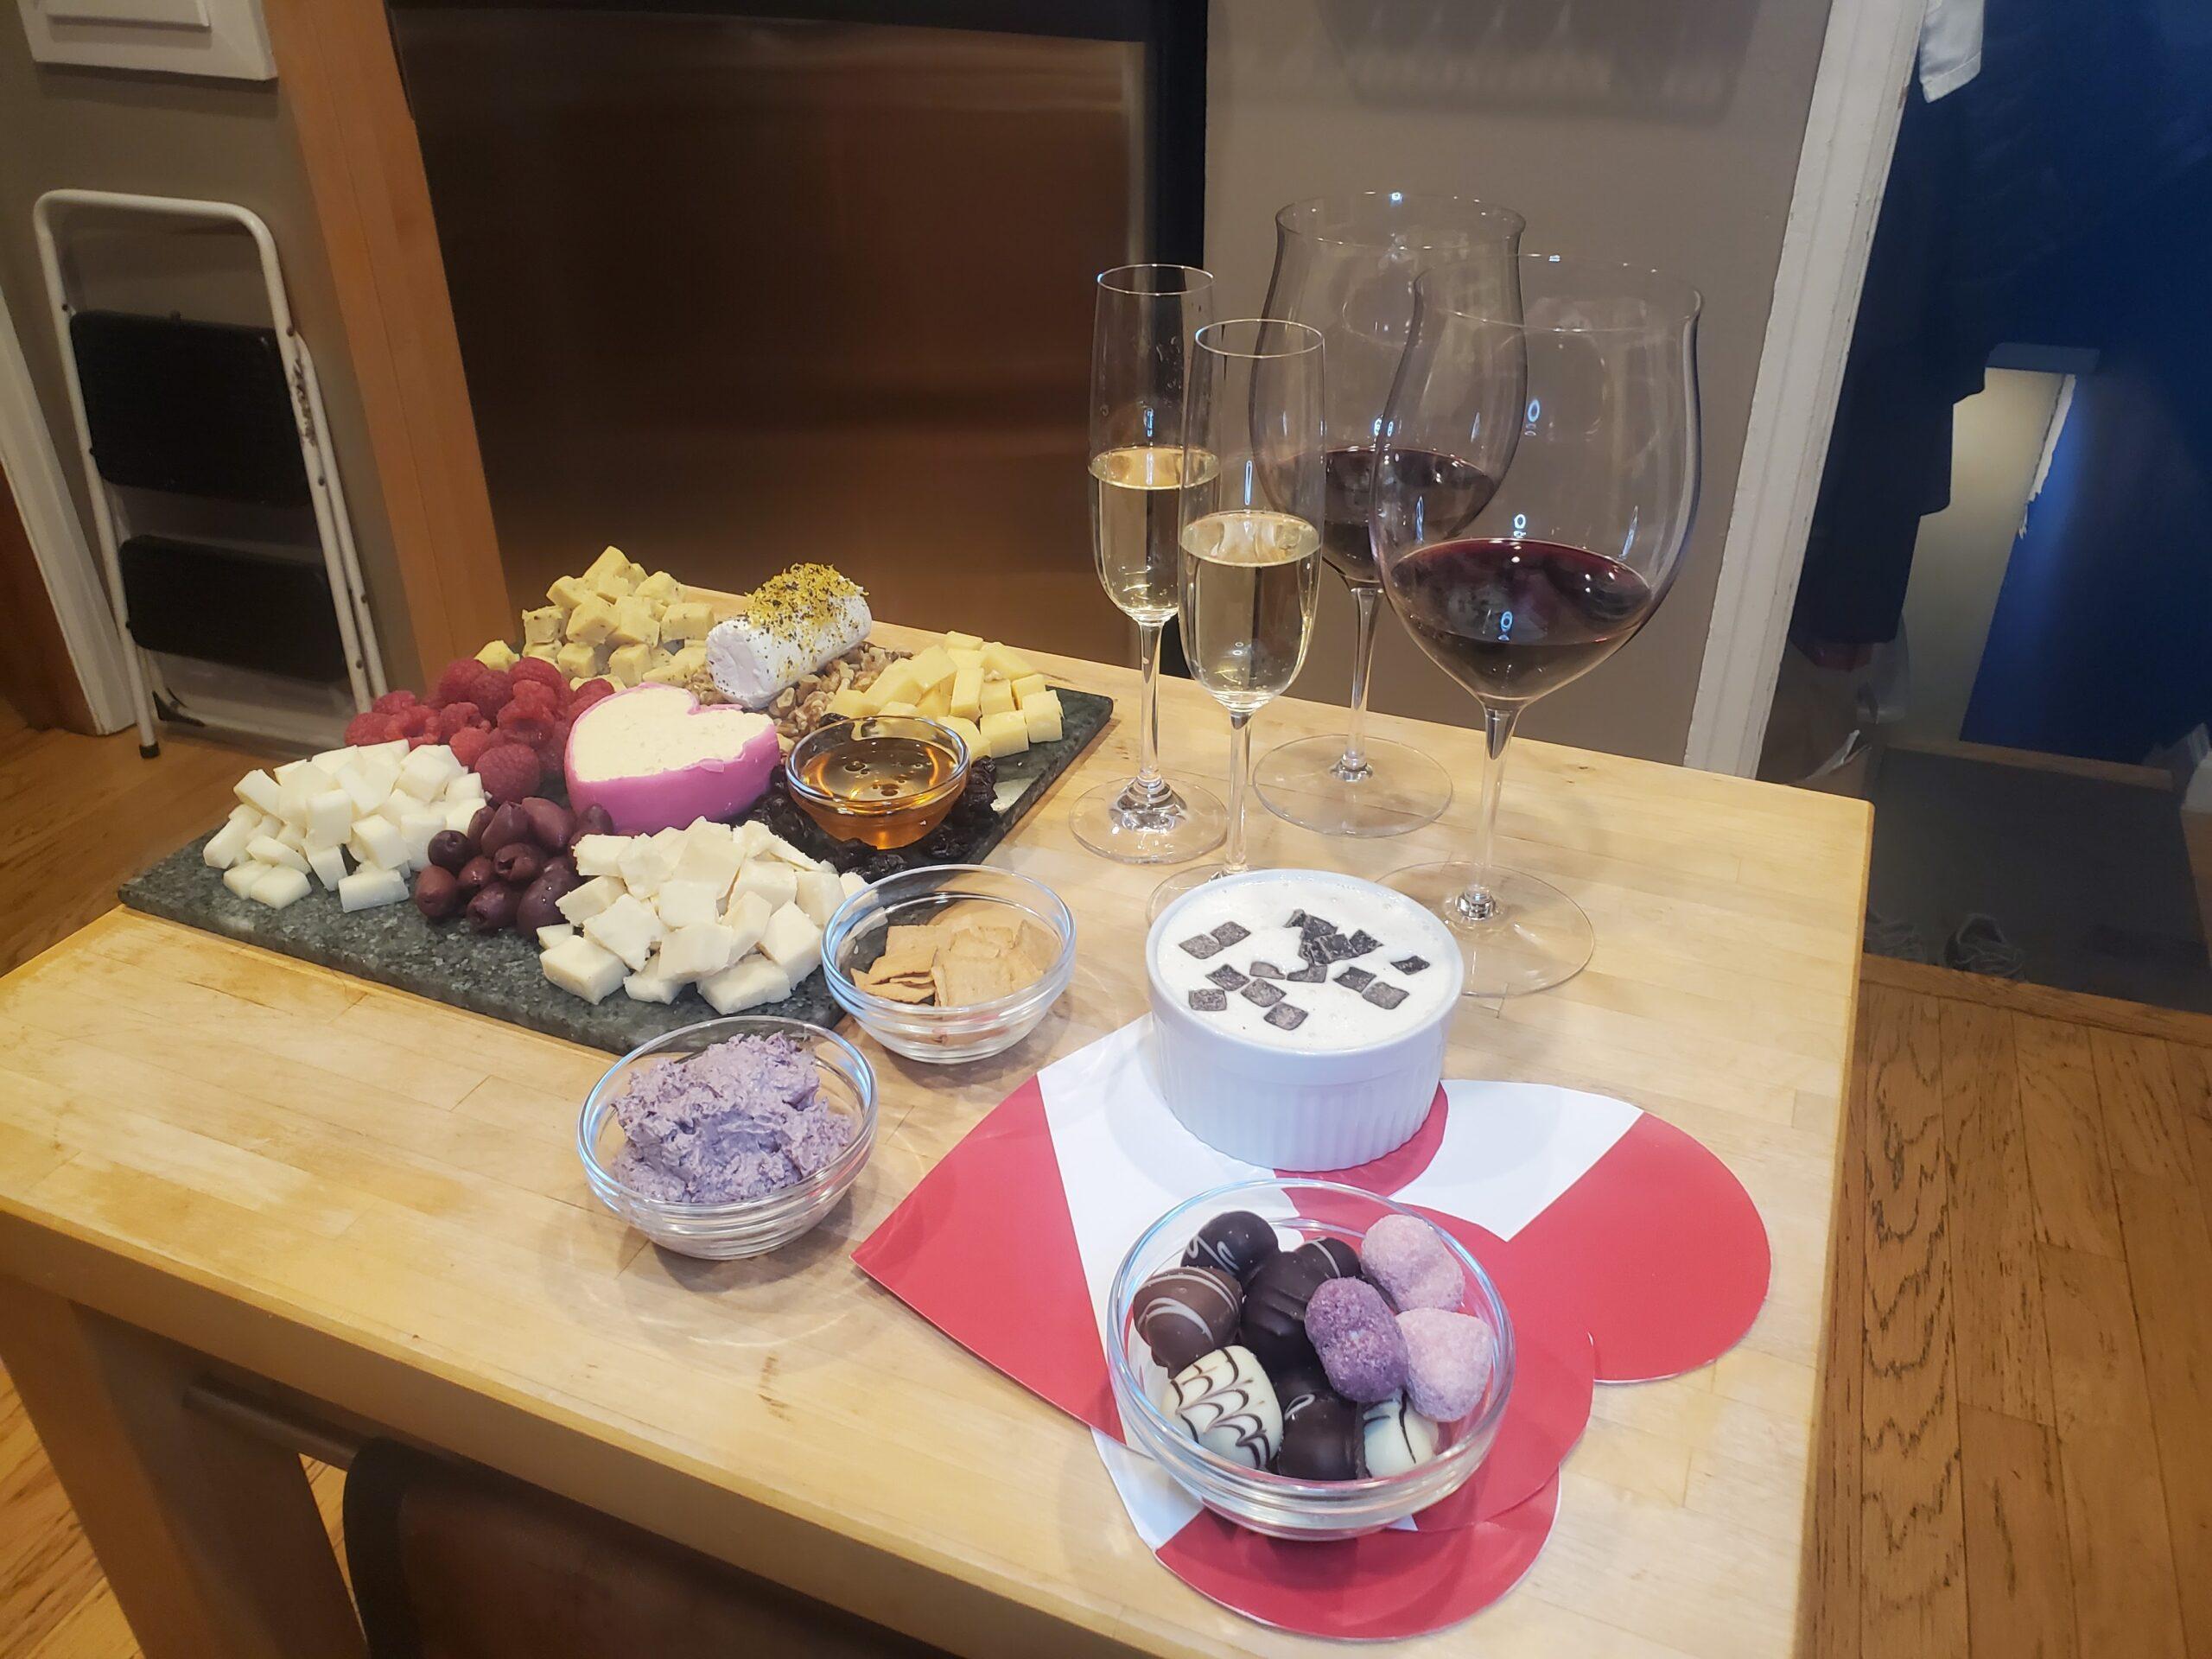 Unofficial ALDI Cookbook Launches